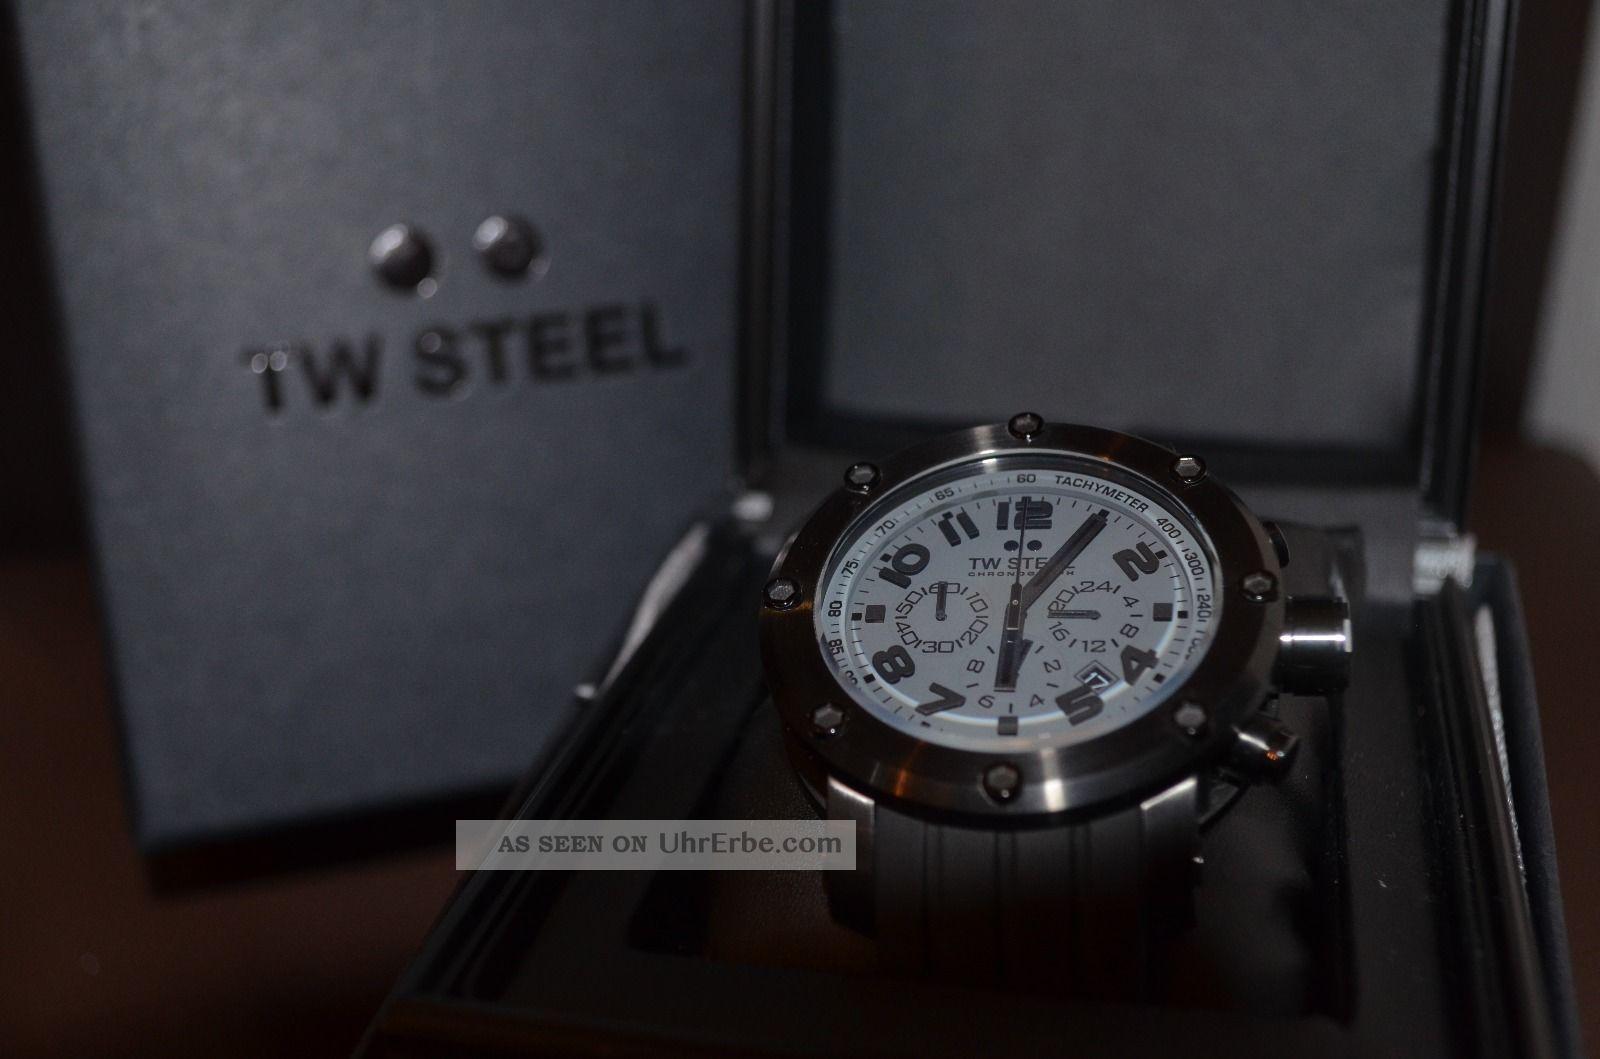 Tw Steel Tw - 128 Kautschuck Armbanduhren Bild